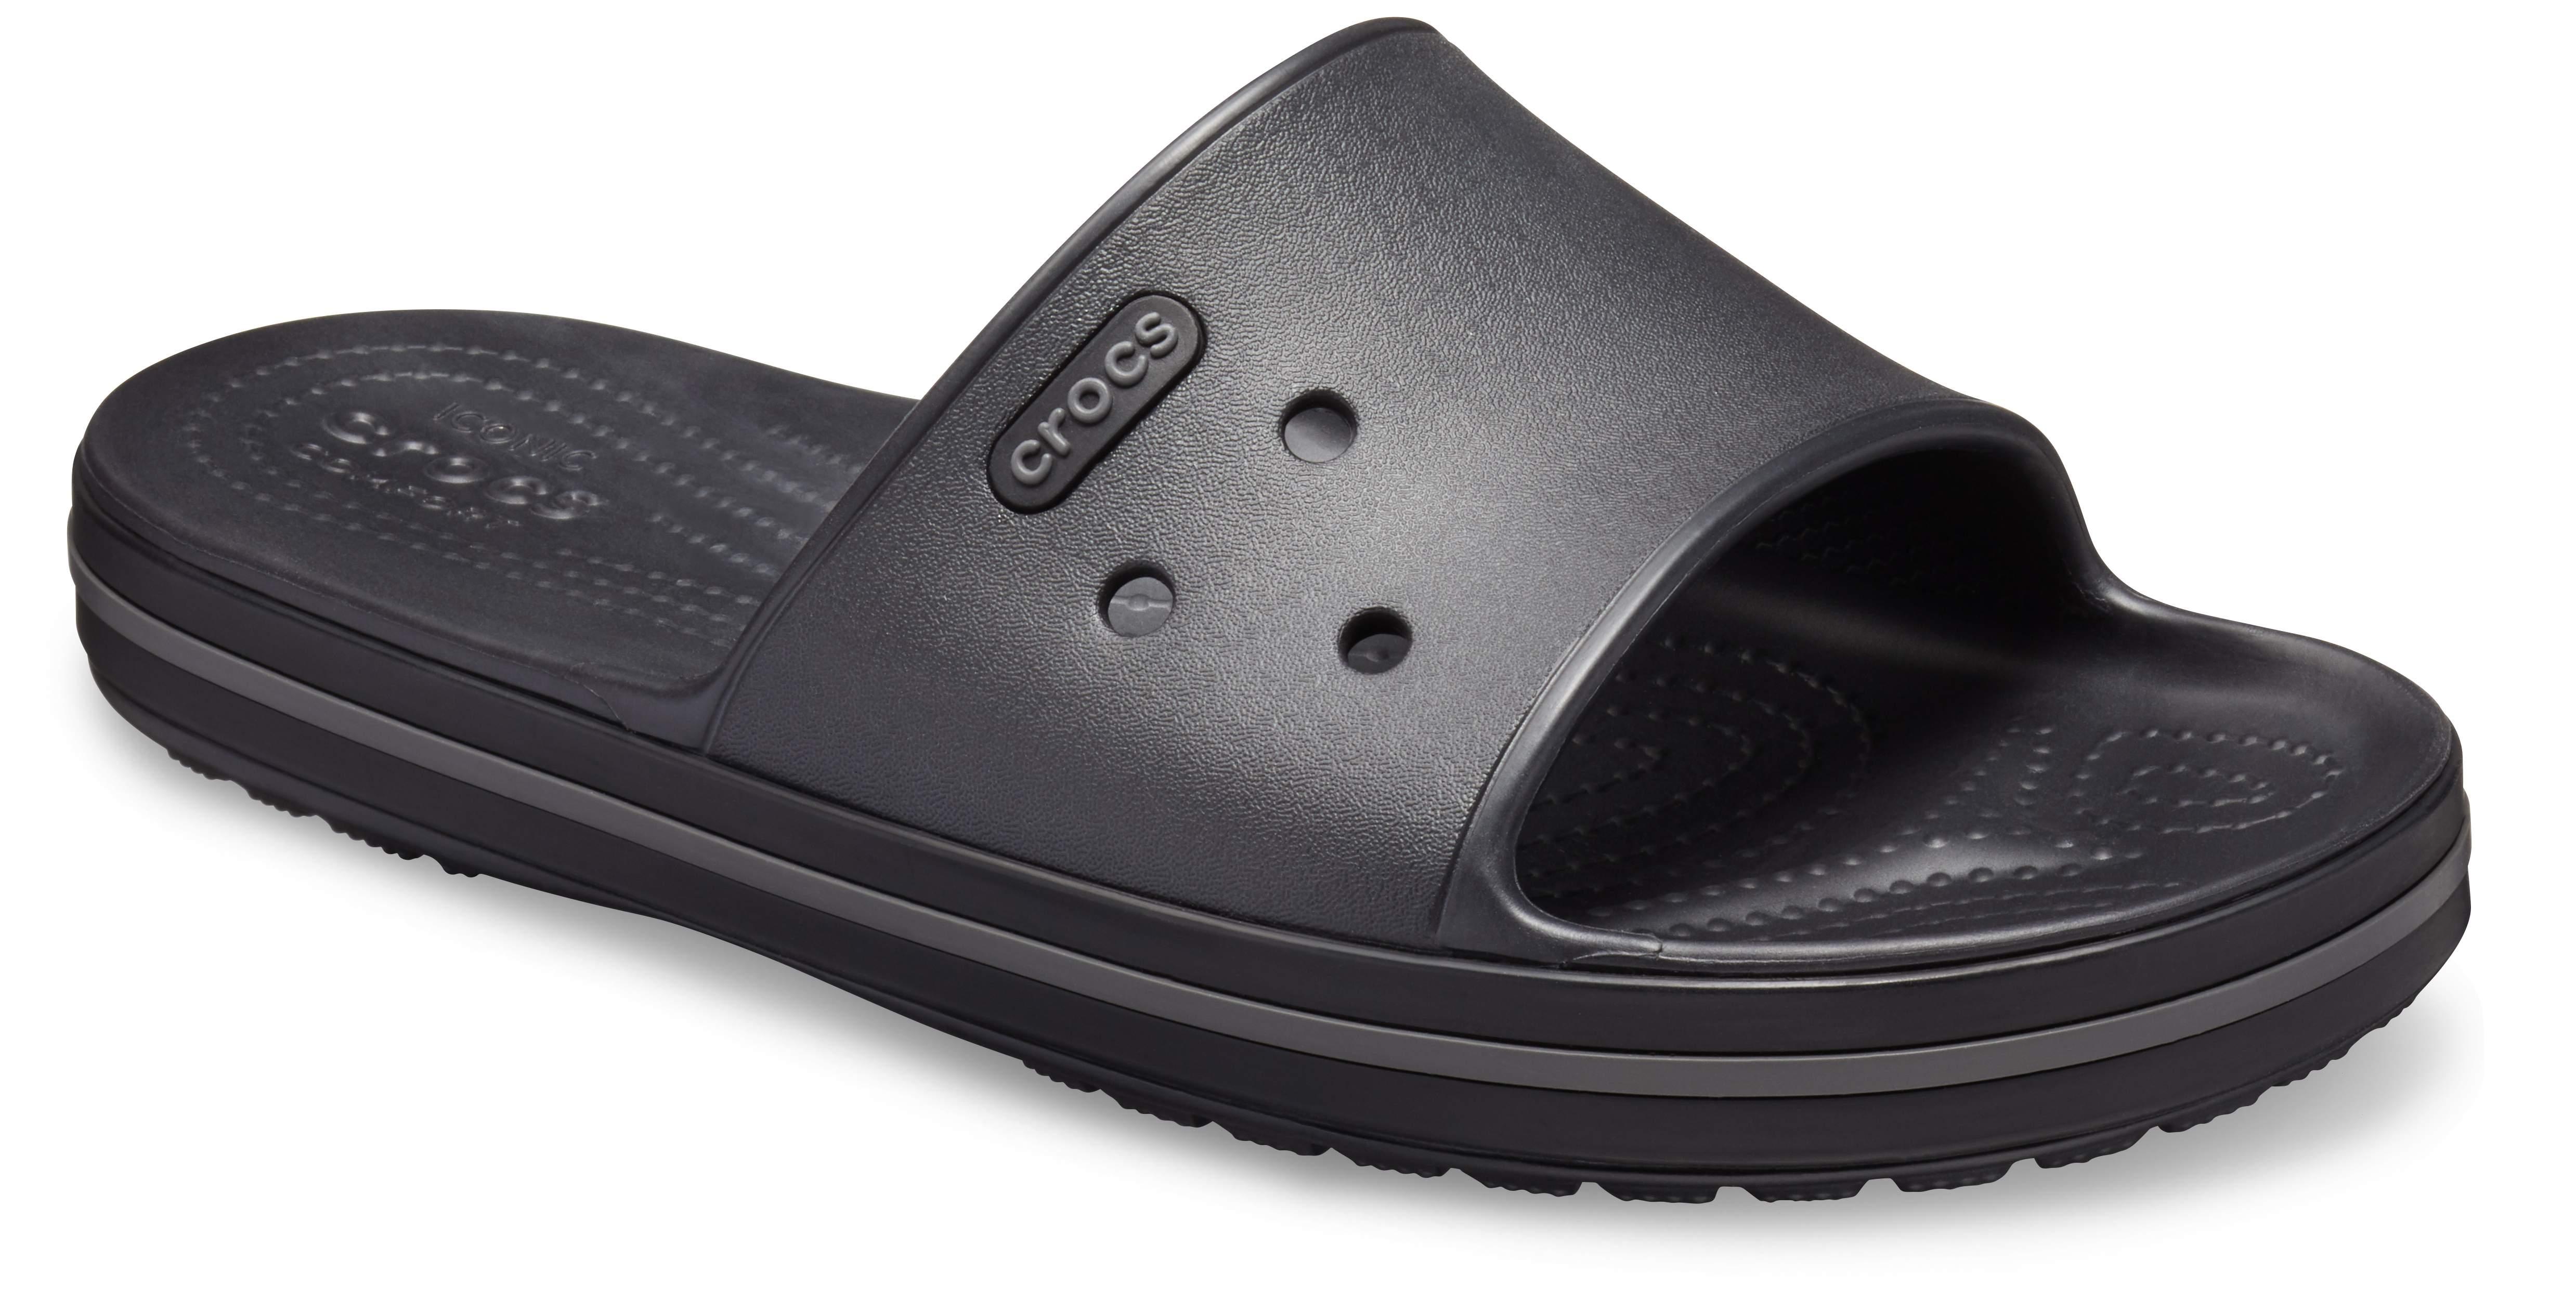 Crocs Crocband Iii Slide Sandal